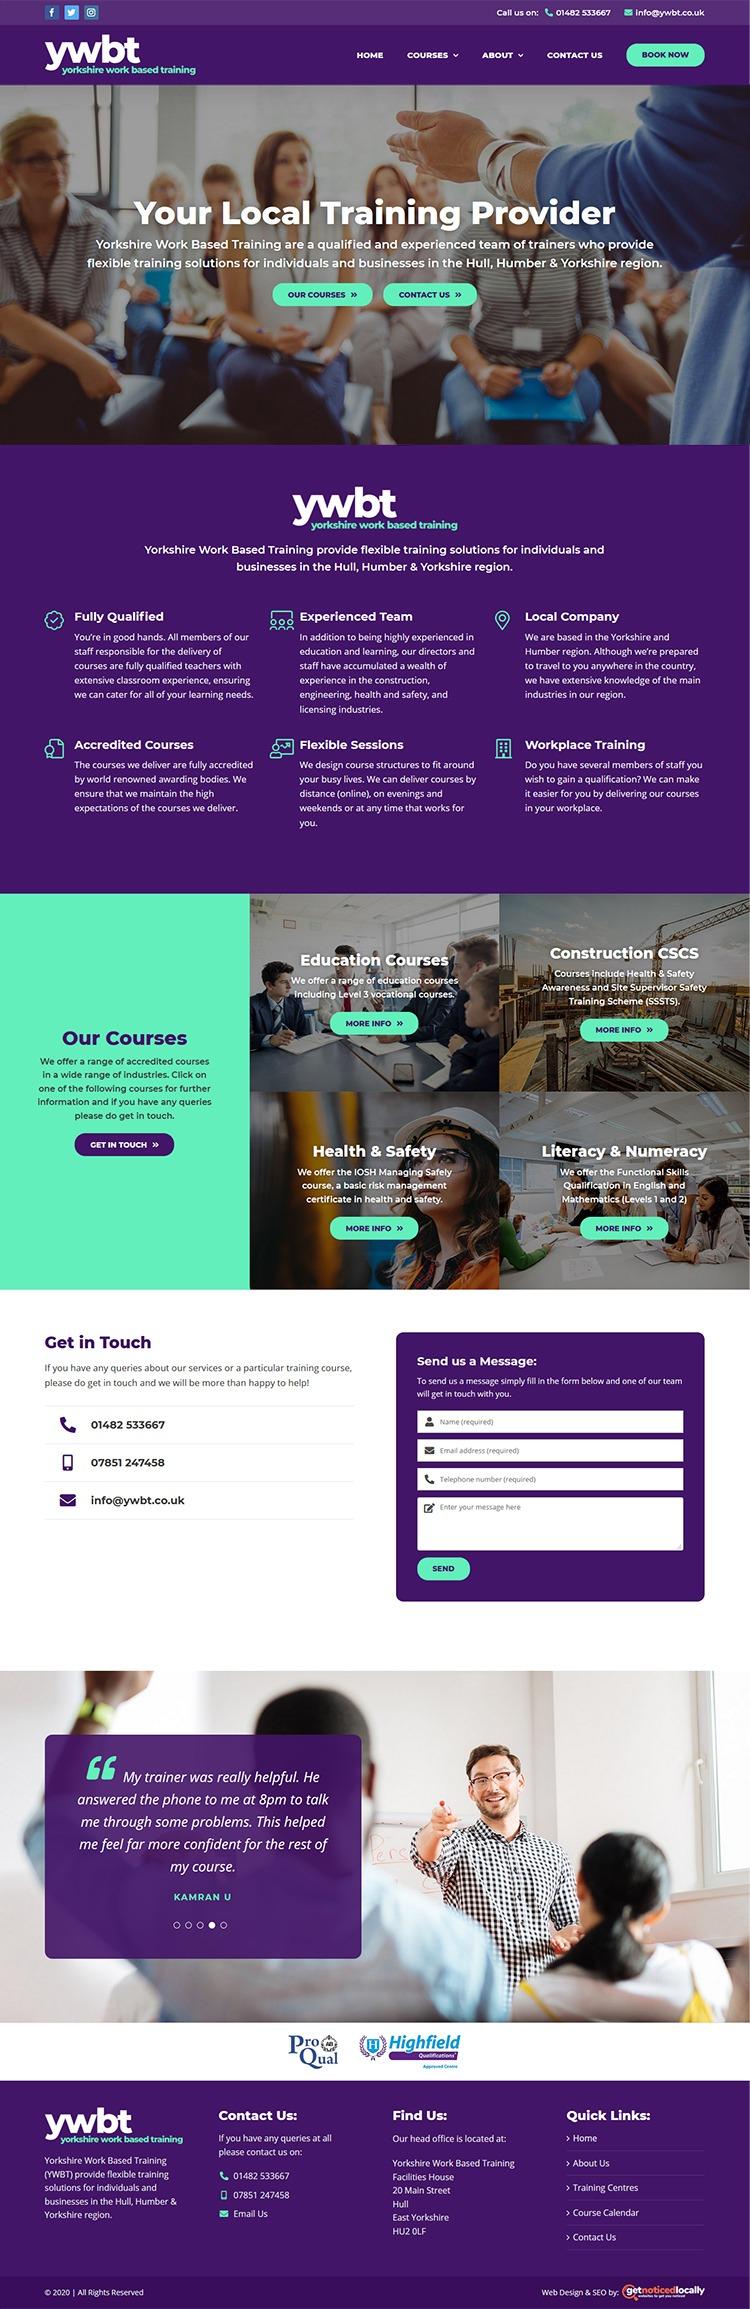 Web Design for Yorkshire Work Based Training